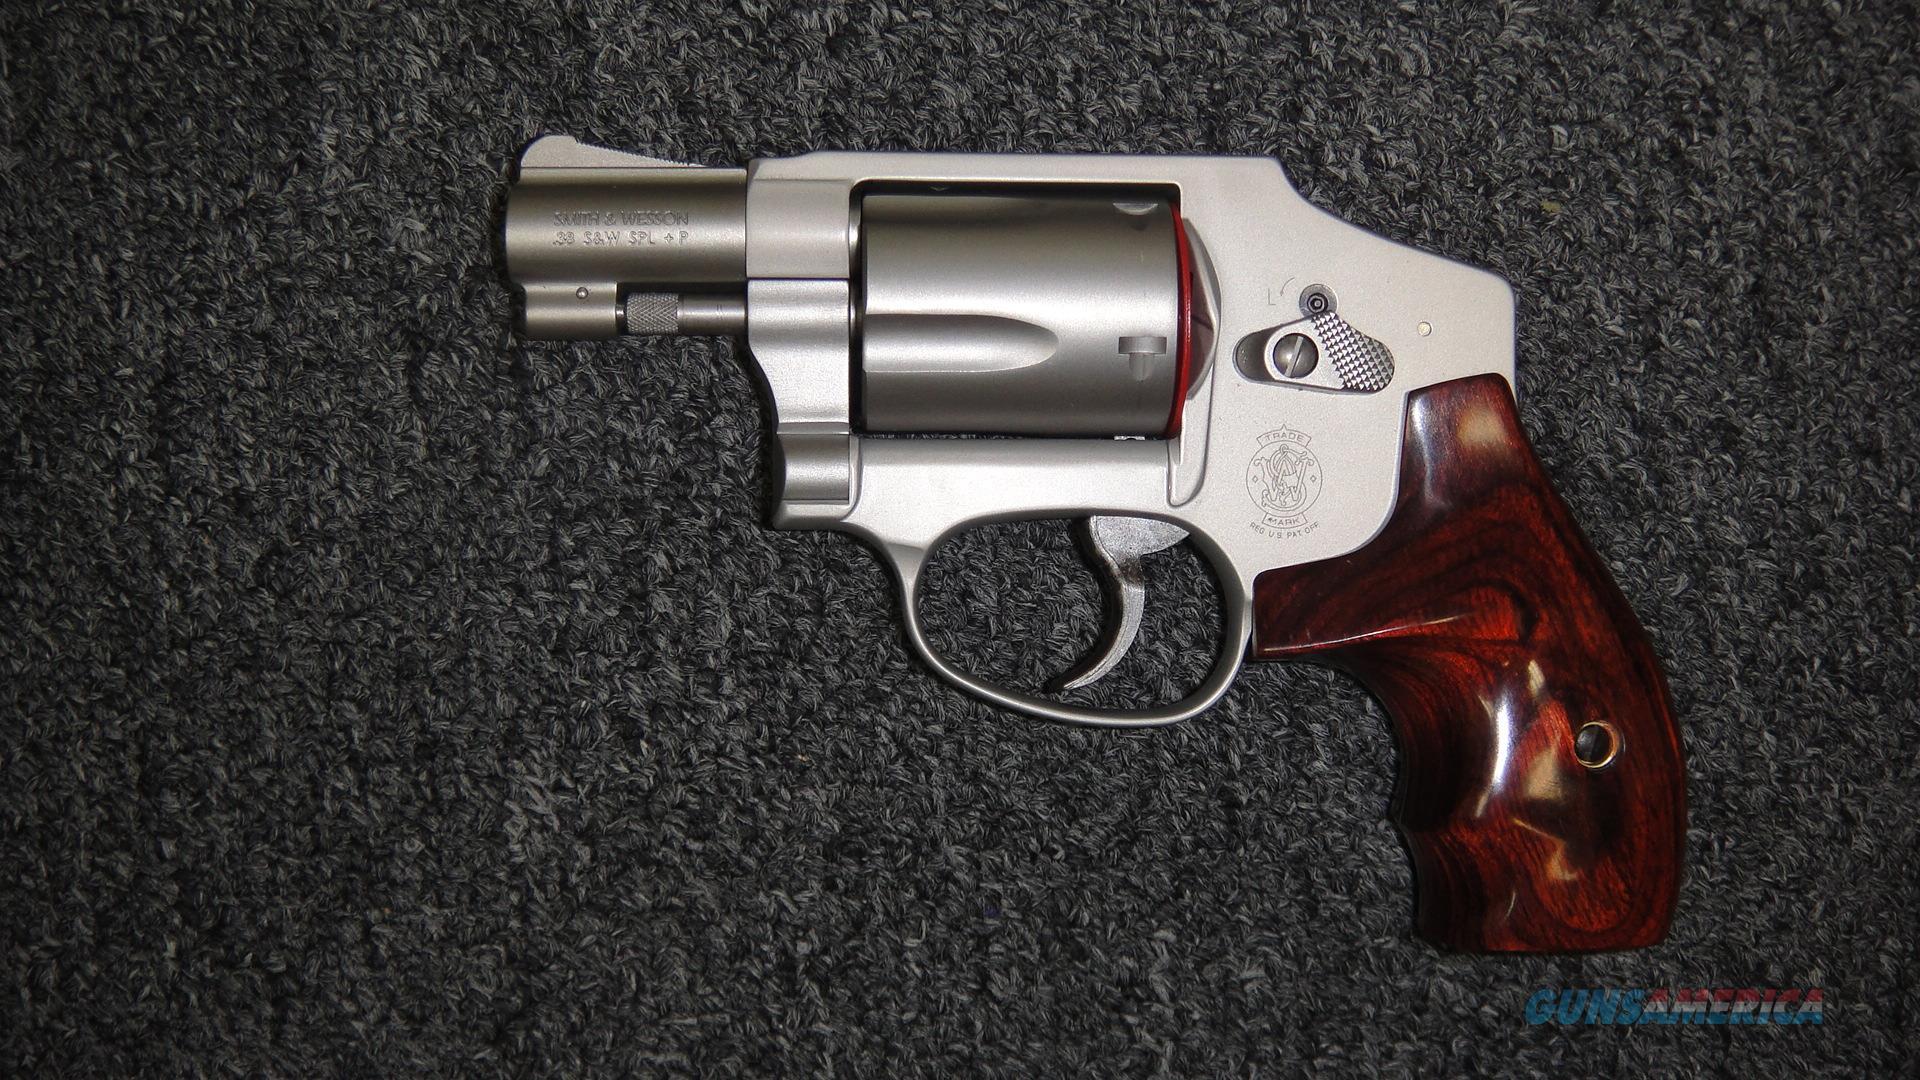 Smith & Wesson 642-2 Lady Smith .38 Spl  Guns > Pistols > Smith & Wesson Revolvers > Small Frame ( J )